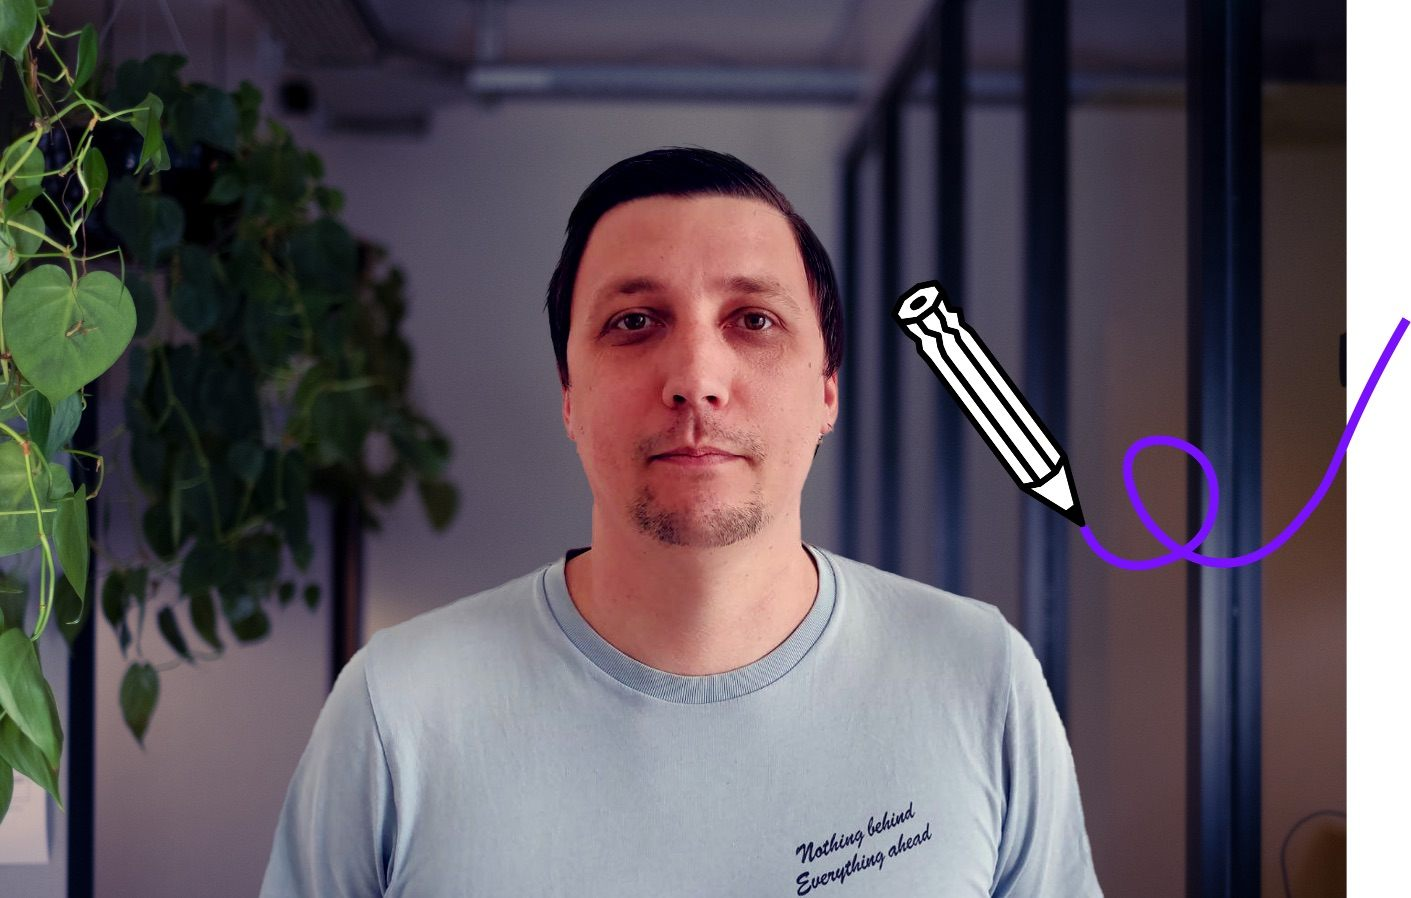 Oleg_Emoticon-1